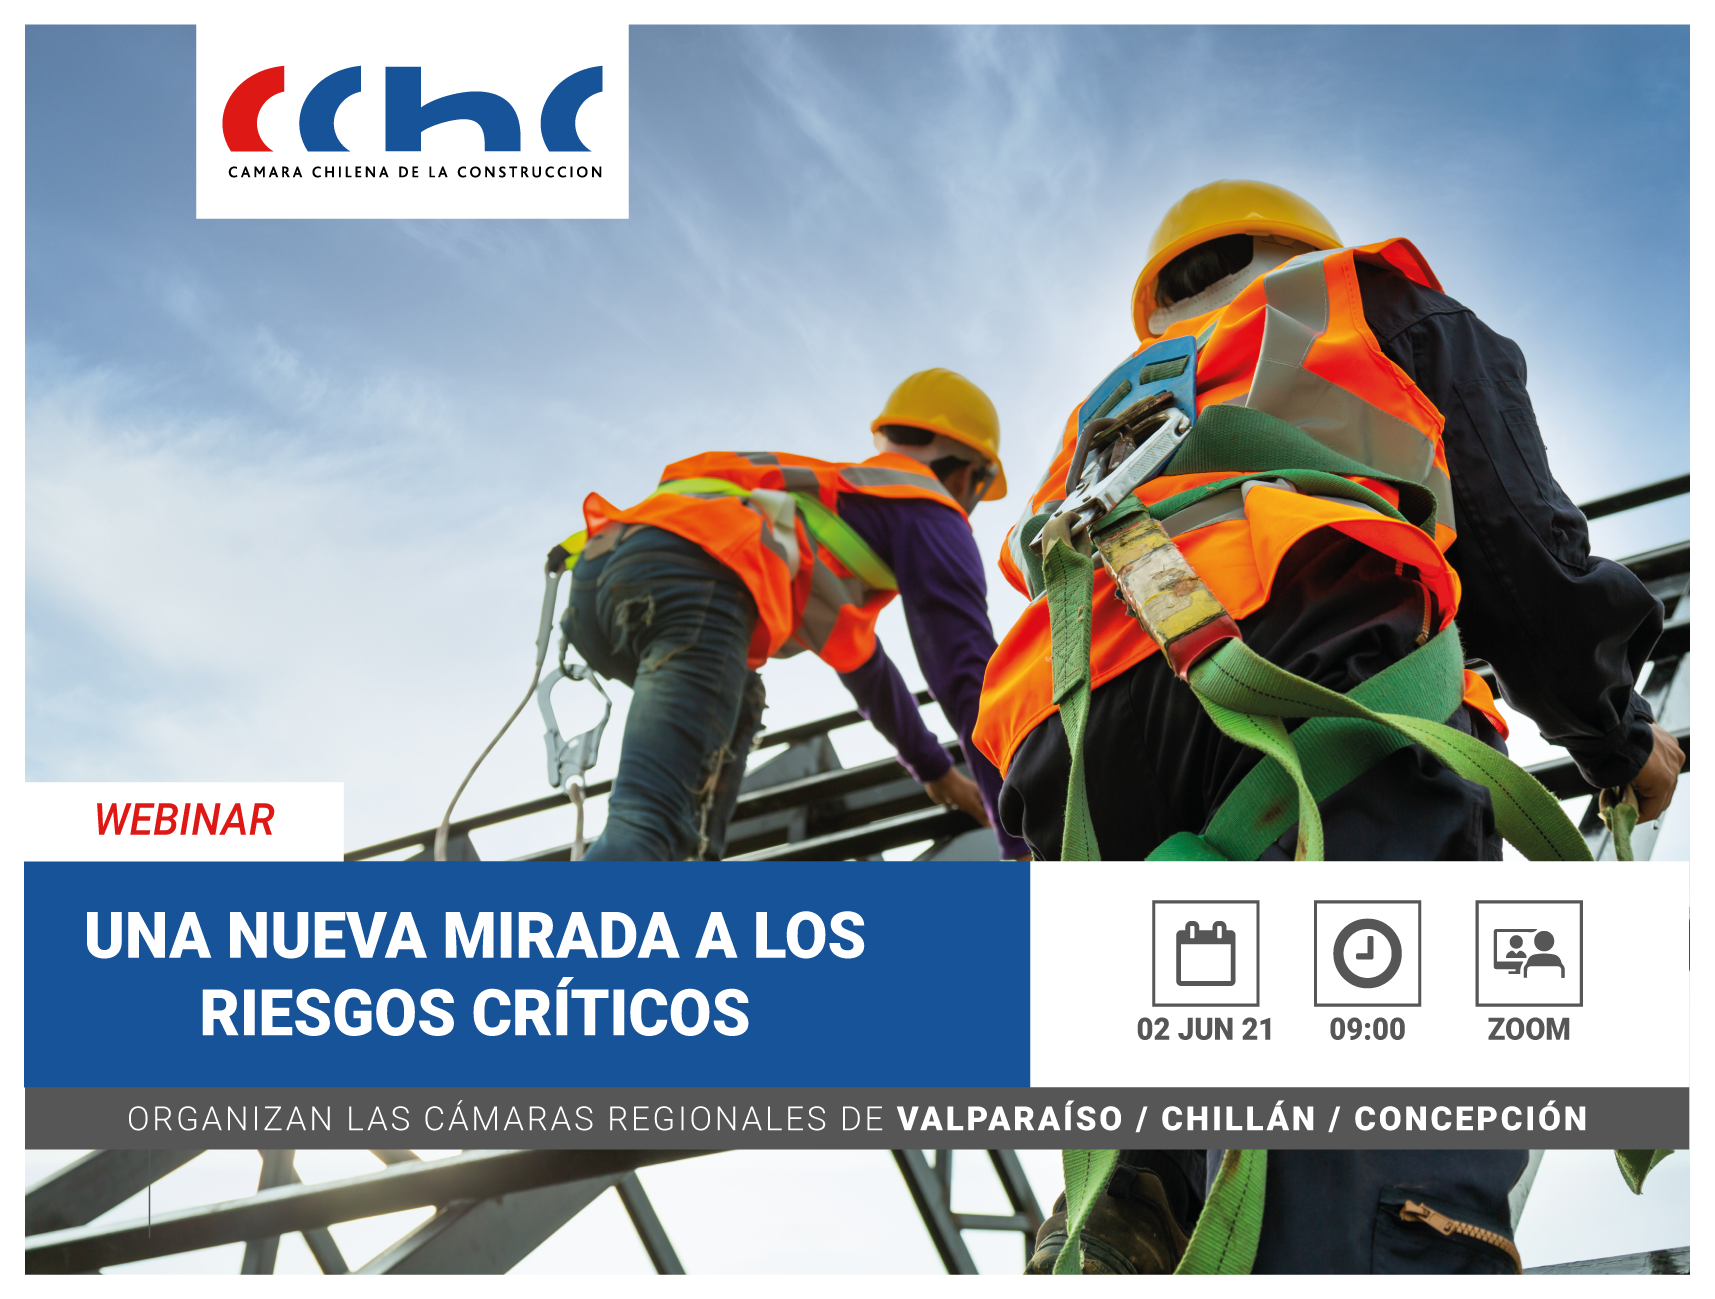 CChC-riesgos-criticos-03_1.png